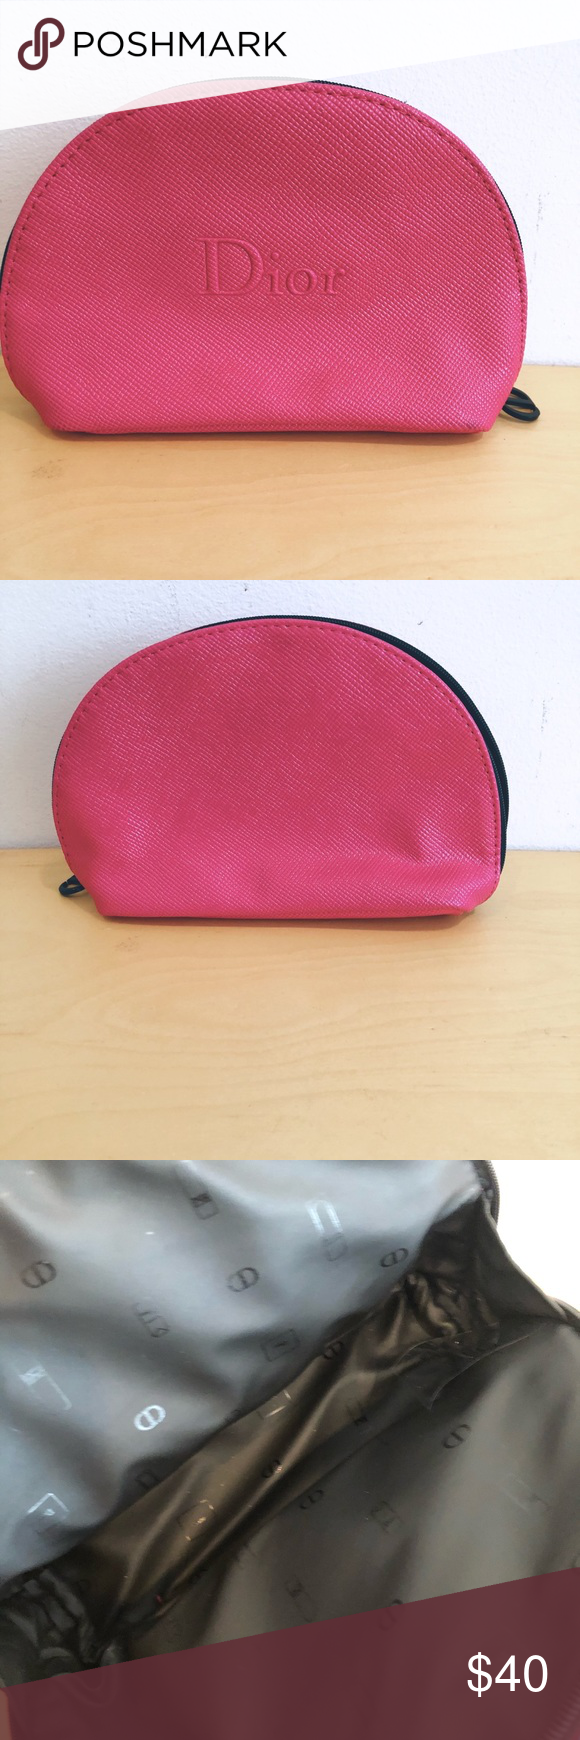 CHRISTIAN DIOR Hot Pink Makeup Pouch Makeup pouch, Pouch